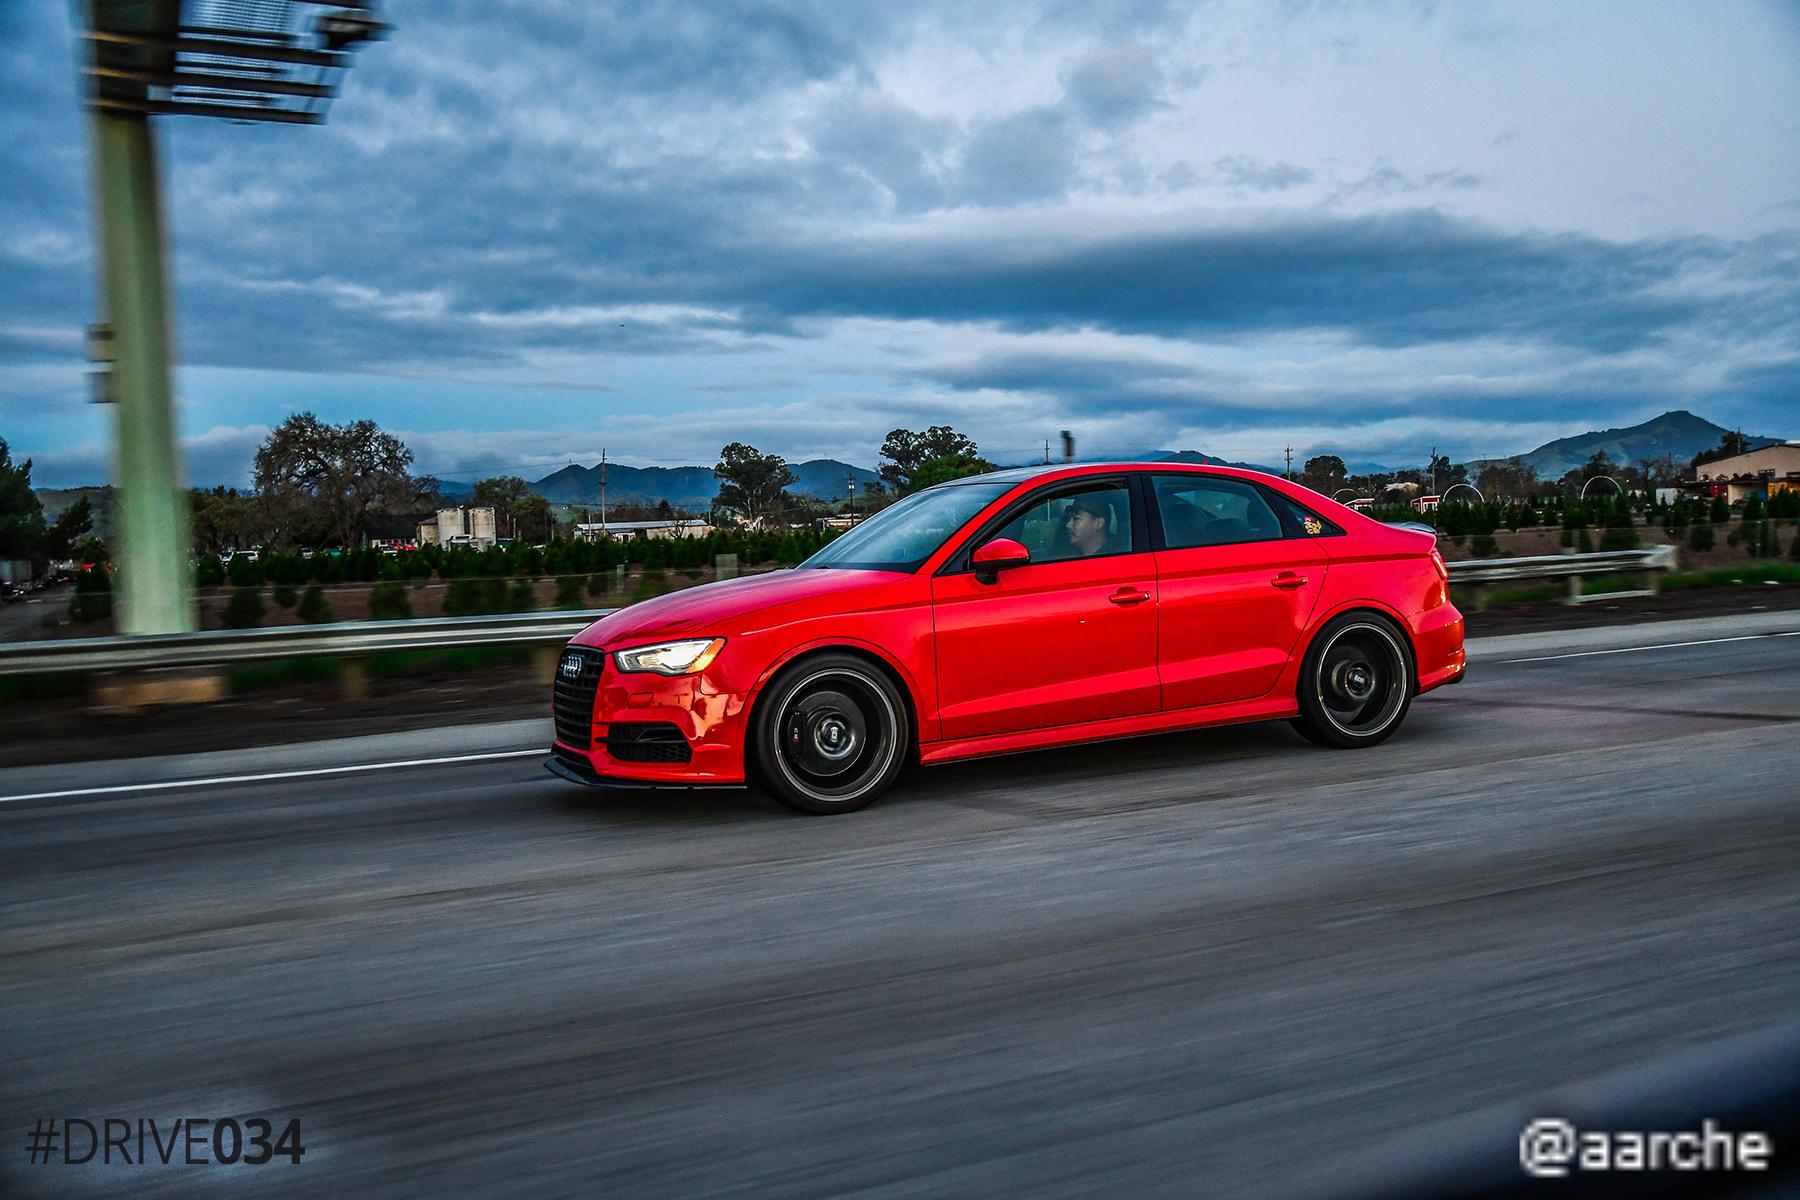 Modded 8V Audi S3 Rolling Shot